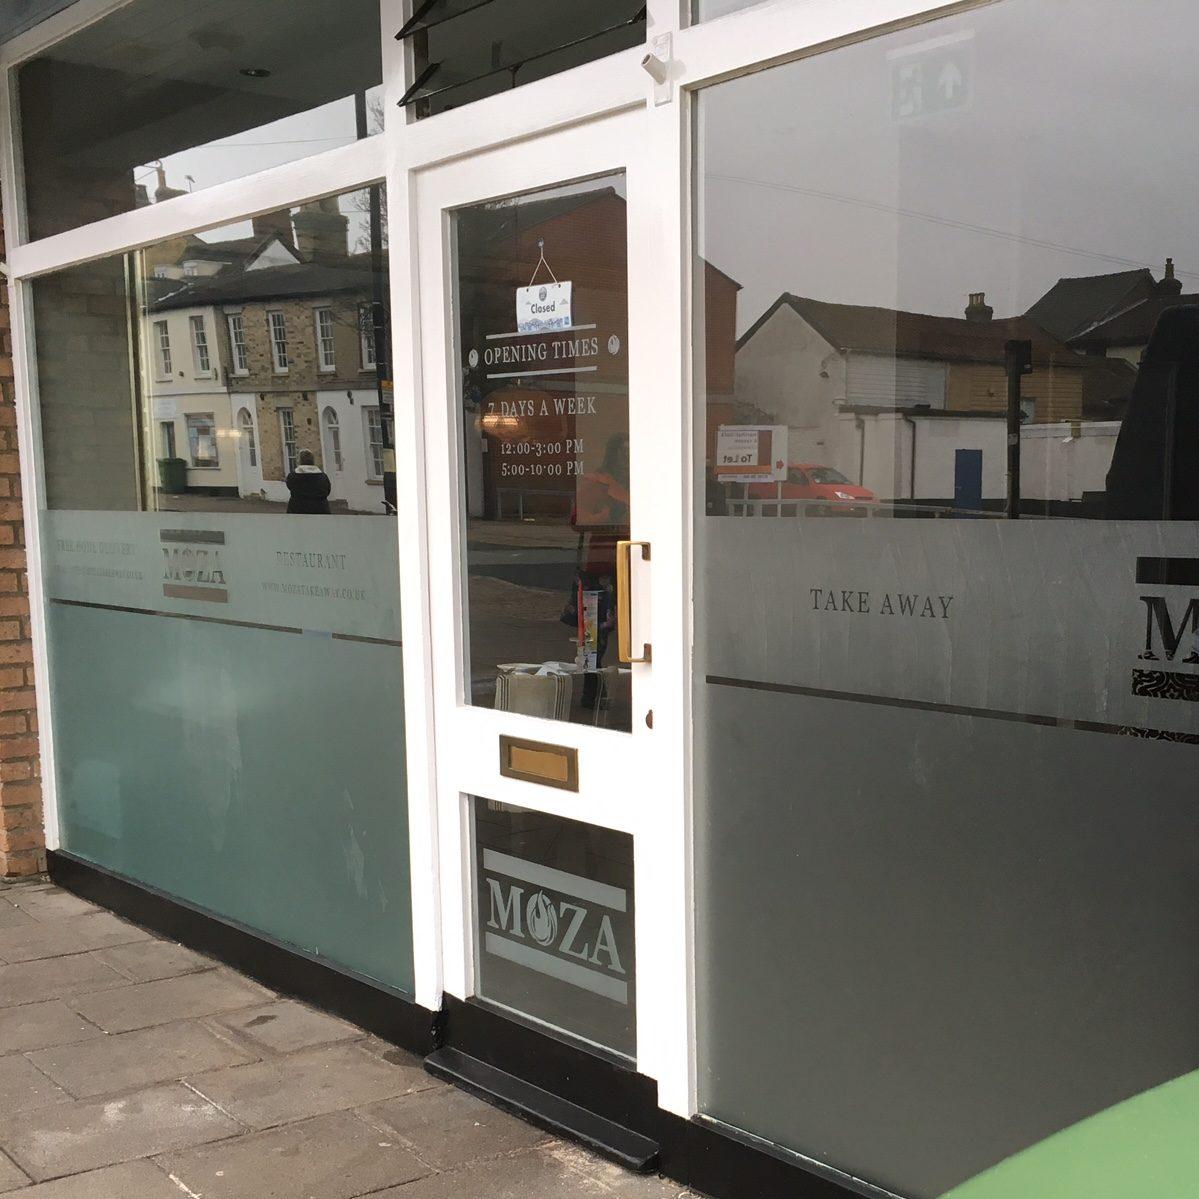 Shop Signs in Bury St Edmunds, Suffolk